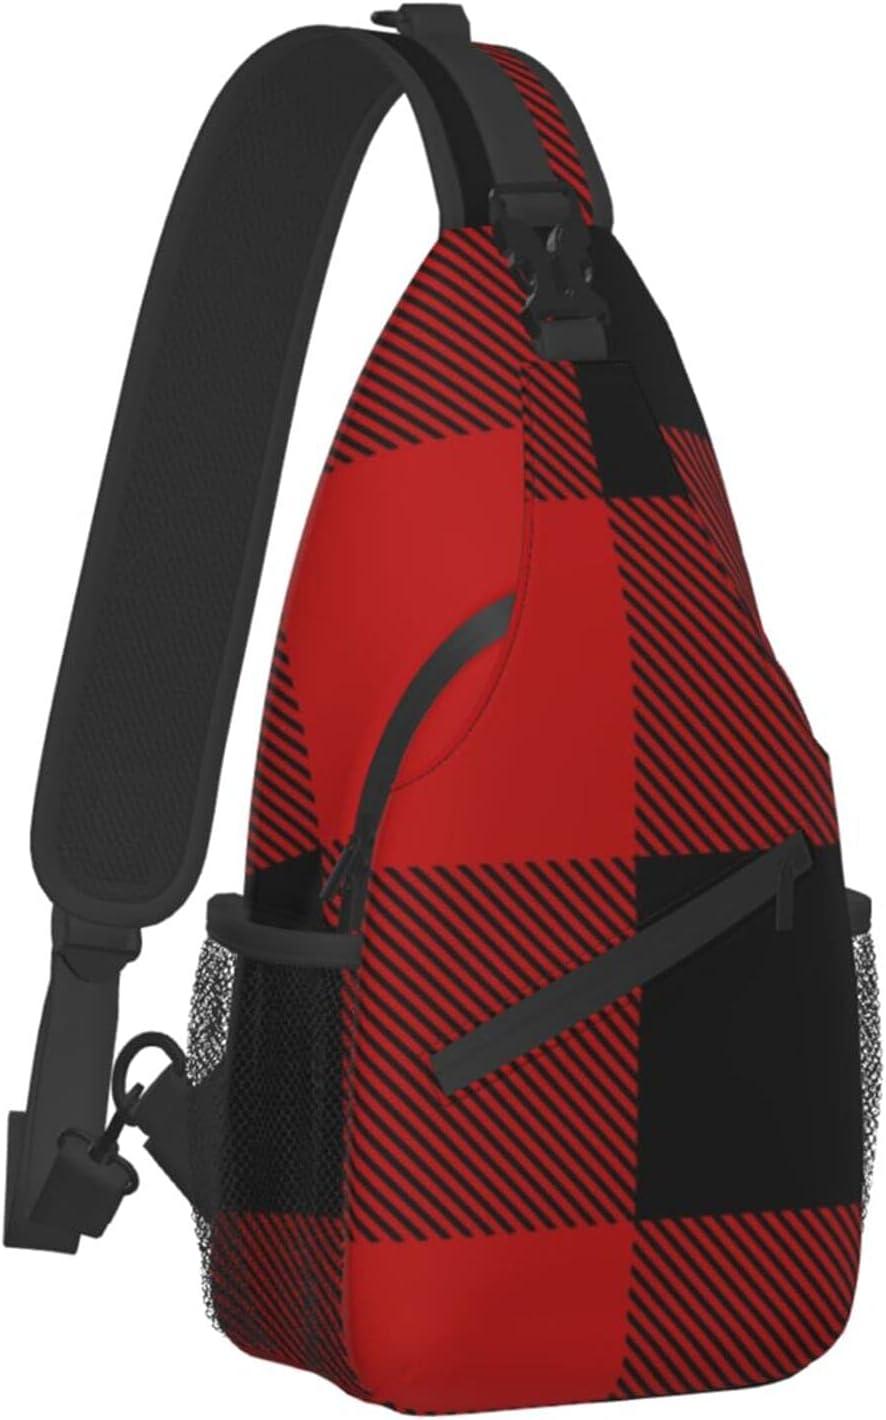 Sling Backpack Travel Hiking Daypack Rope C Lumberjack Plaid Max wholesale 55% OFF Red